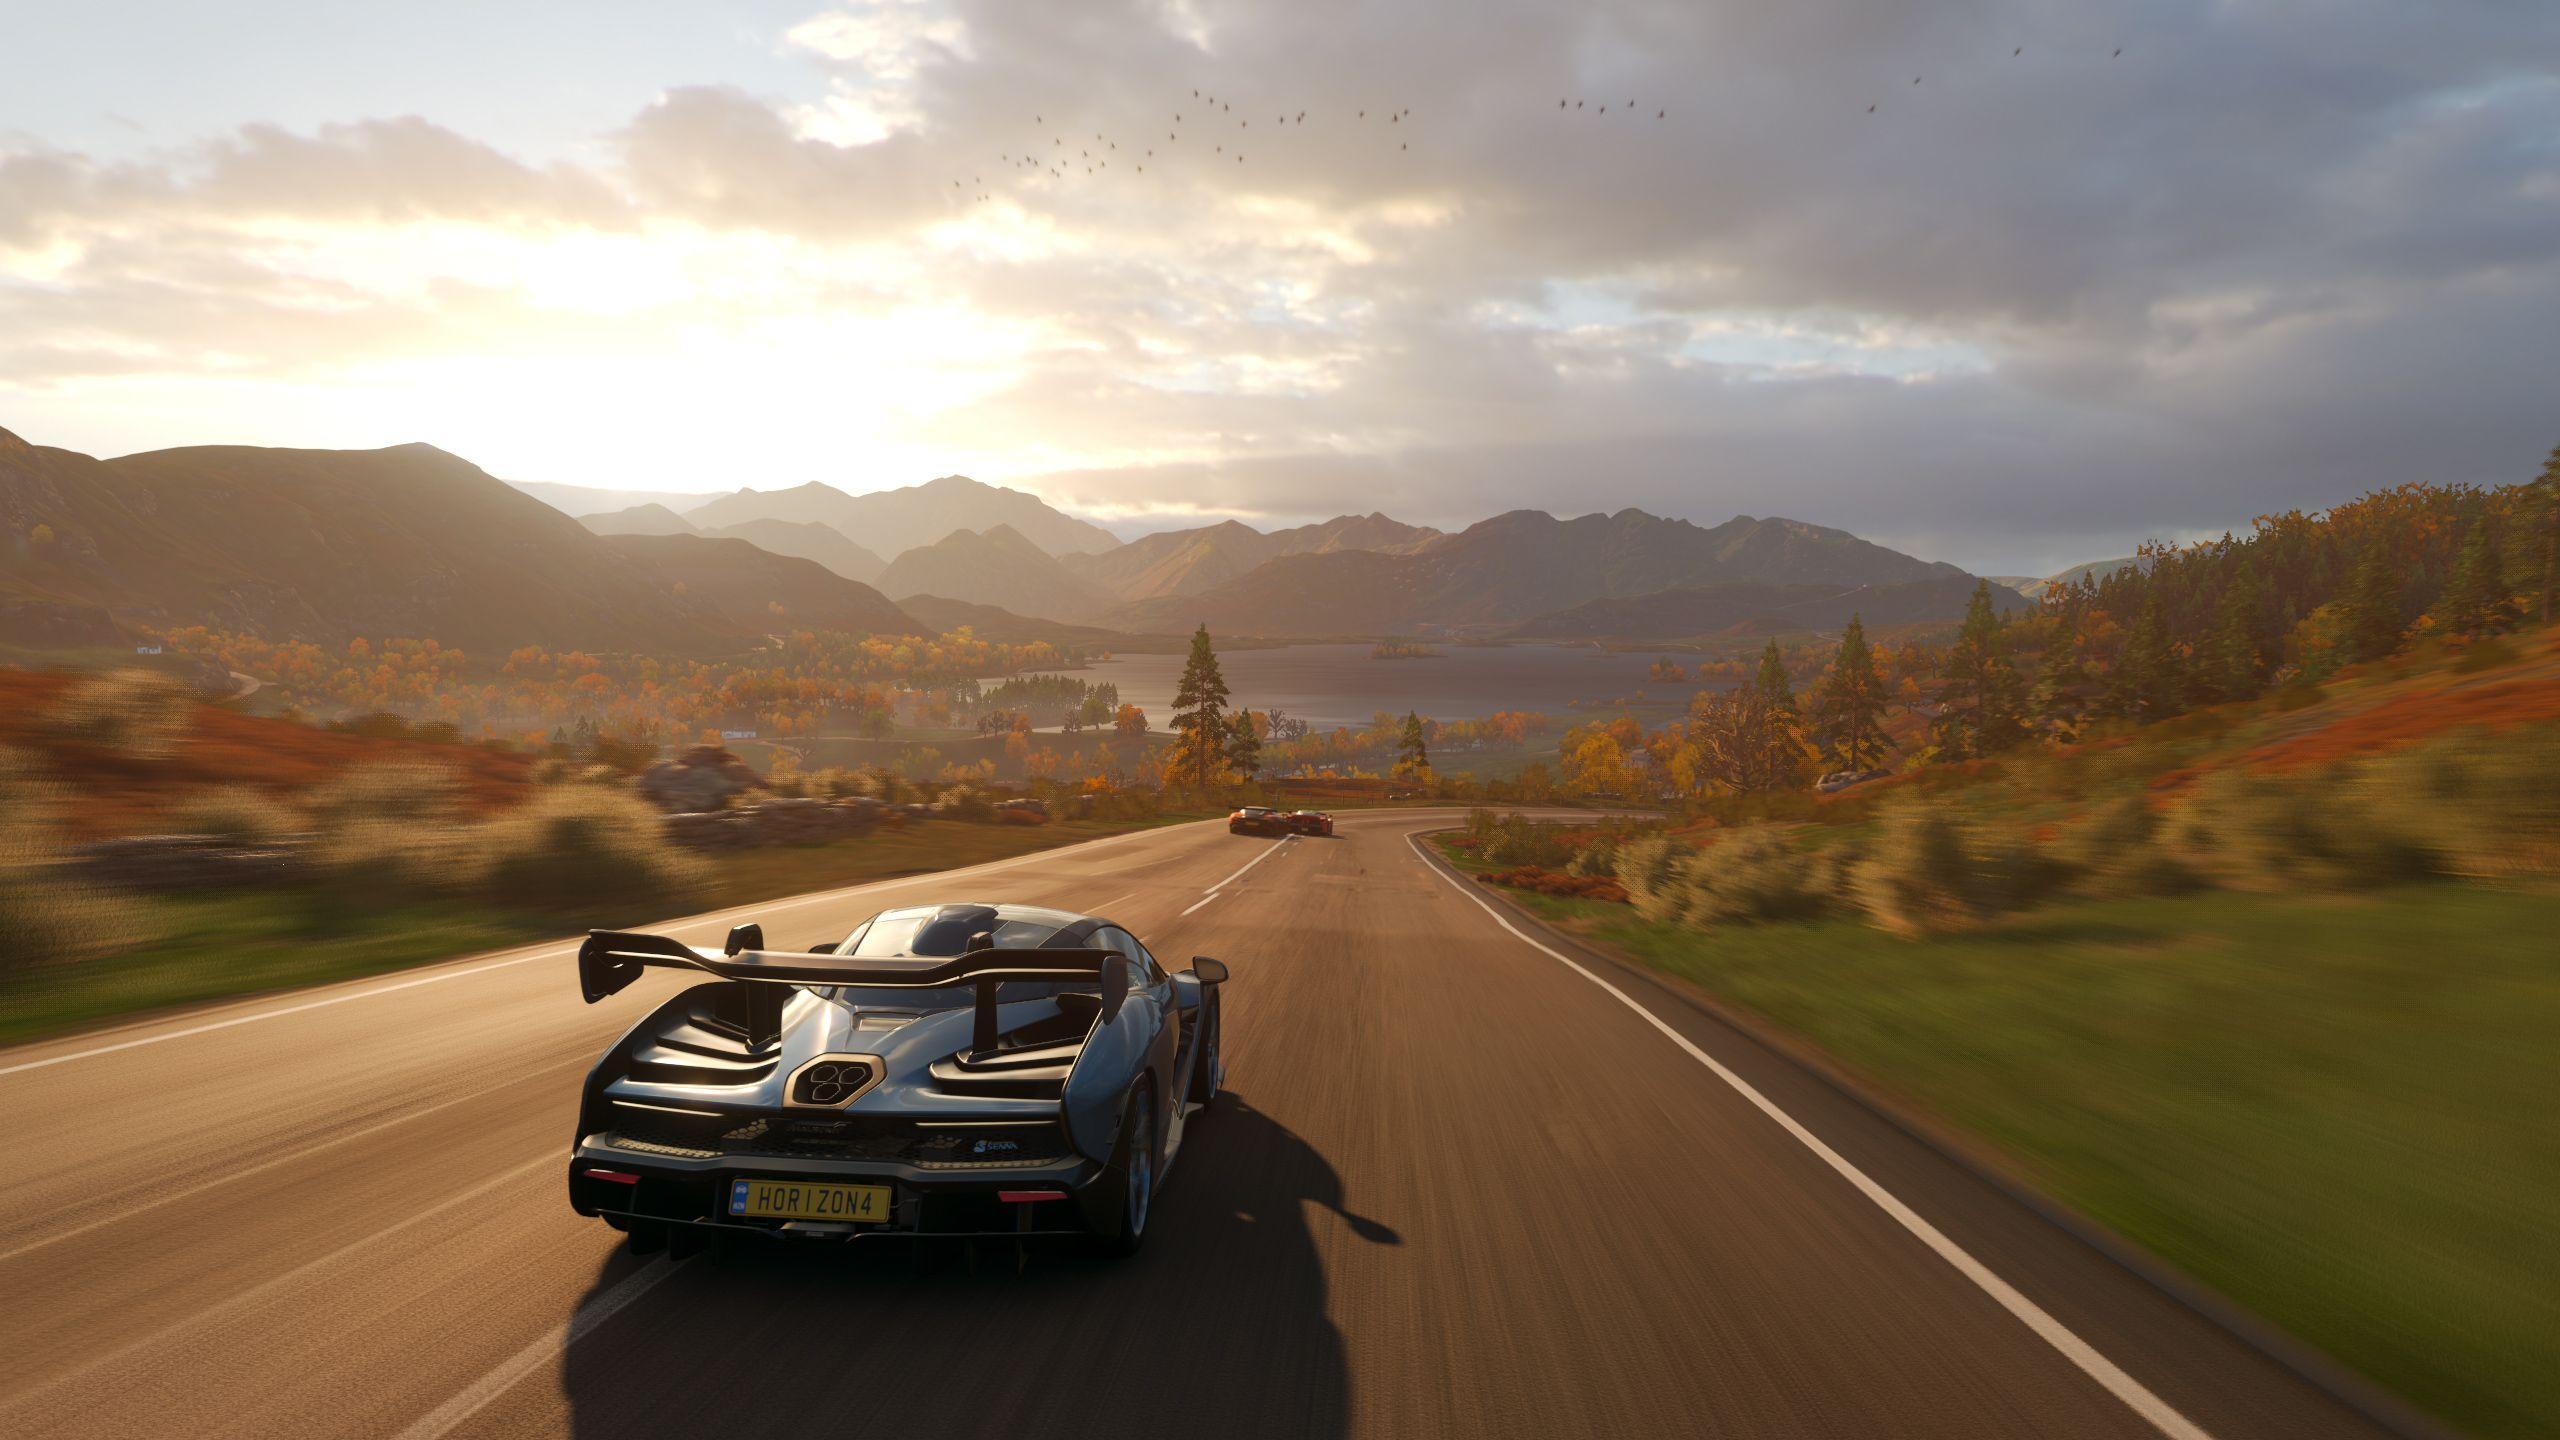 Forza Horizon 4 Wallpapers Top Free Forza Horizon 4